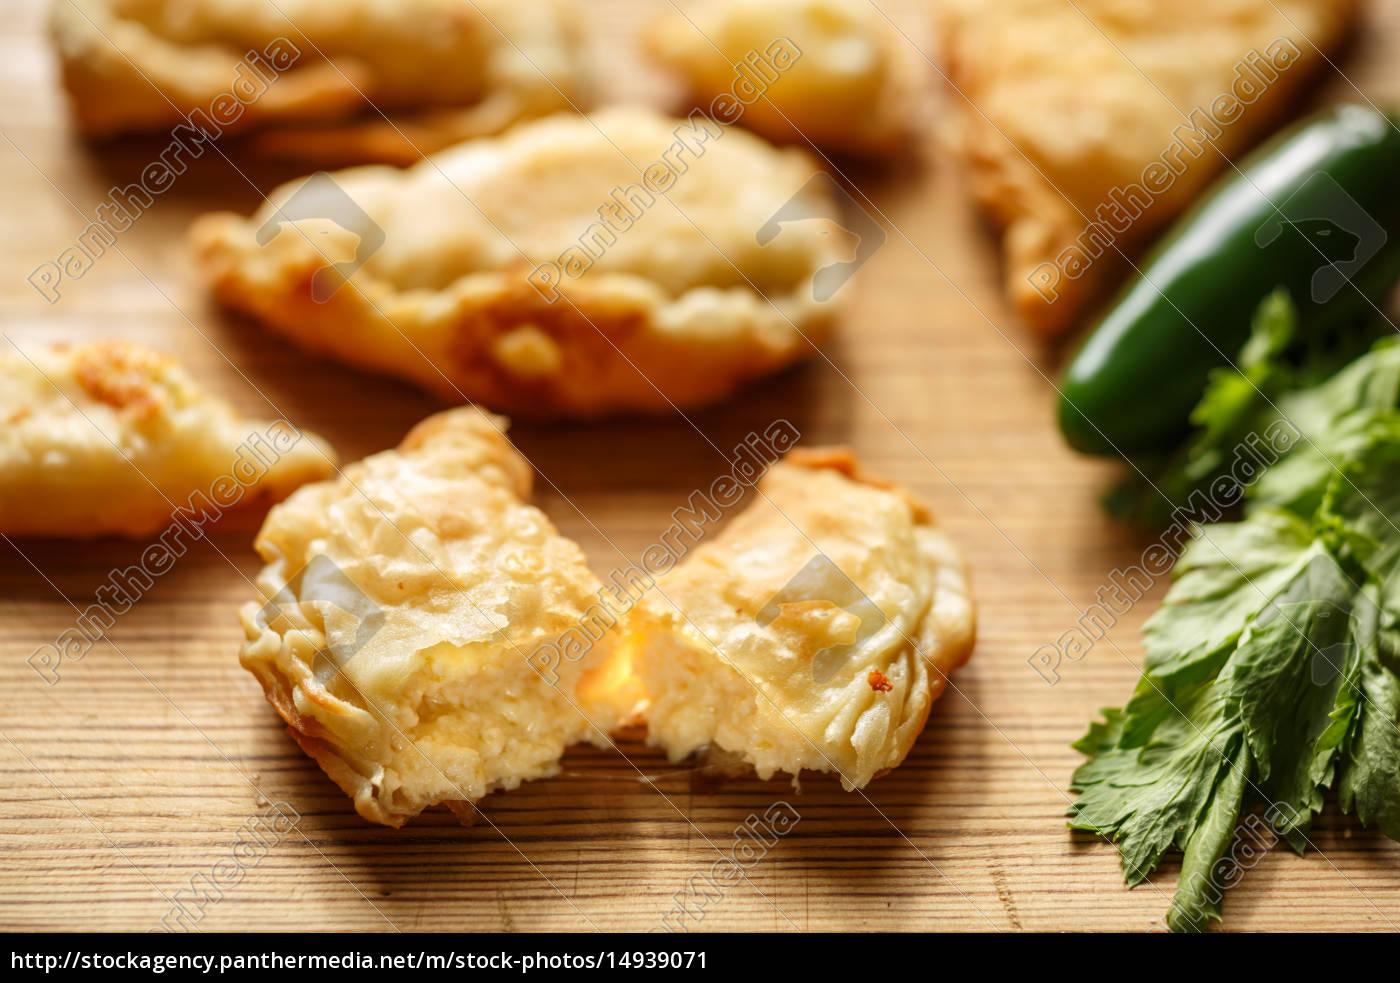 phyllo, cheese, patties - 14939071